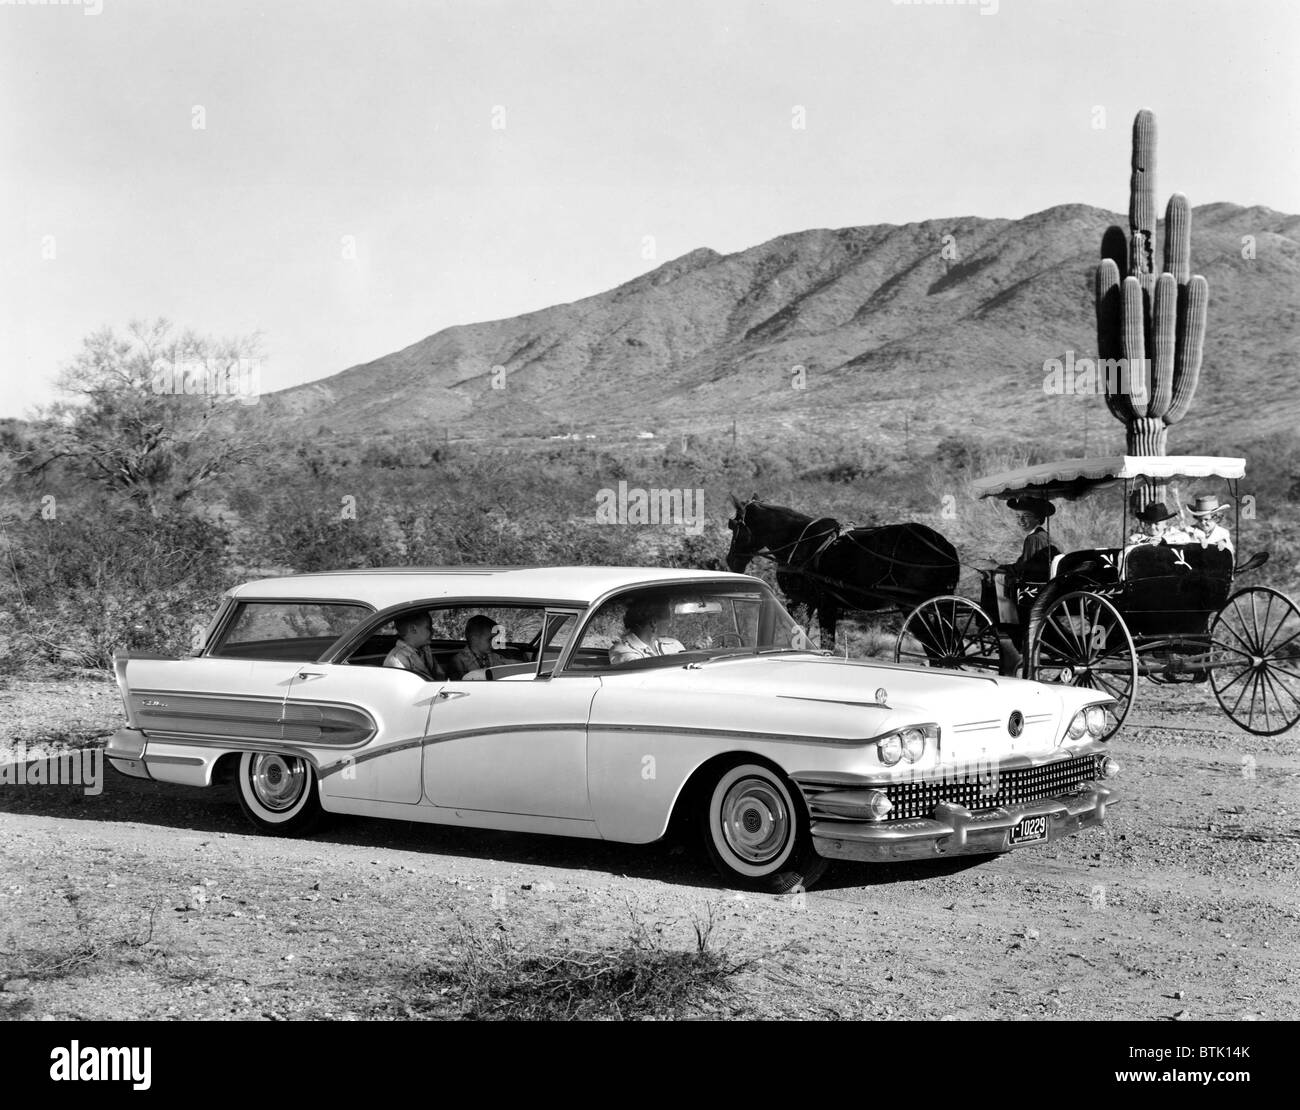 Station Wagon 1958 Buick Caballero